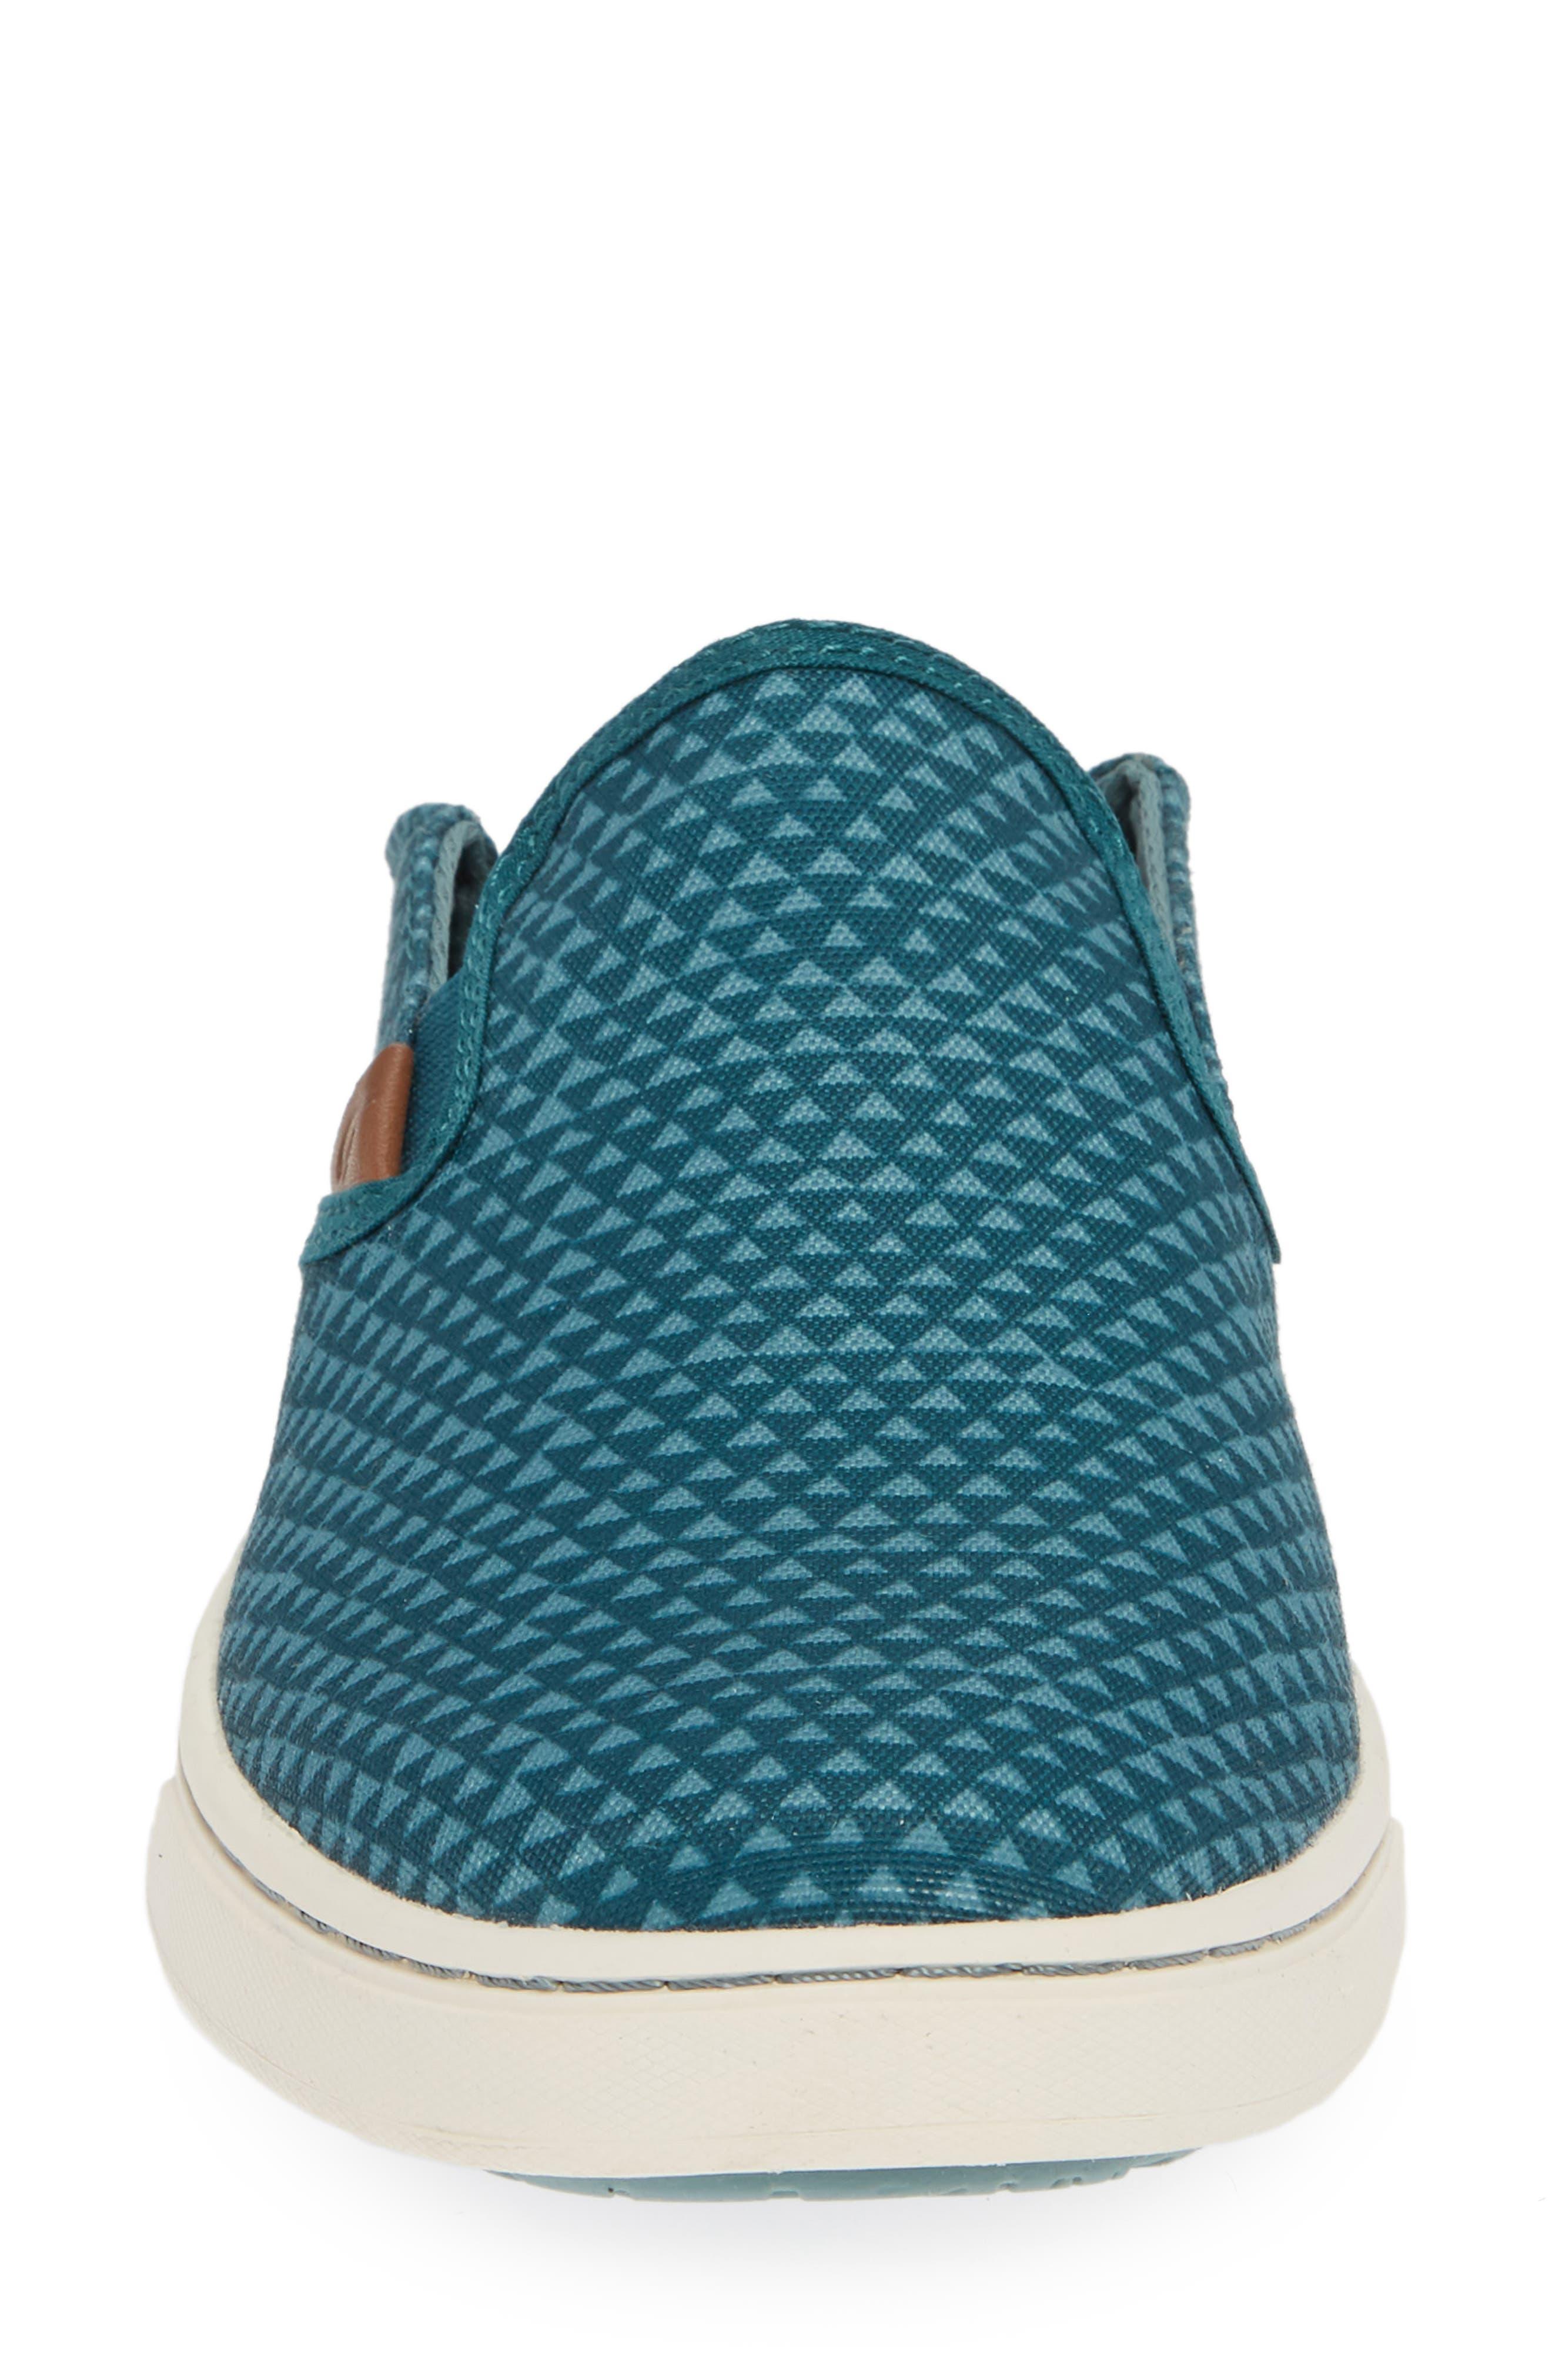 Pehuea Pa'i Convertible Sneaker,                             Alternate thumbnail 5, color,                             DEEP TEAL/ TRIANGLE FABRIC